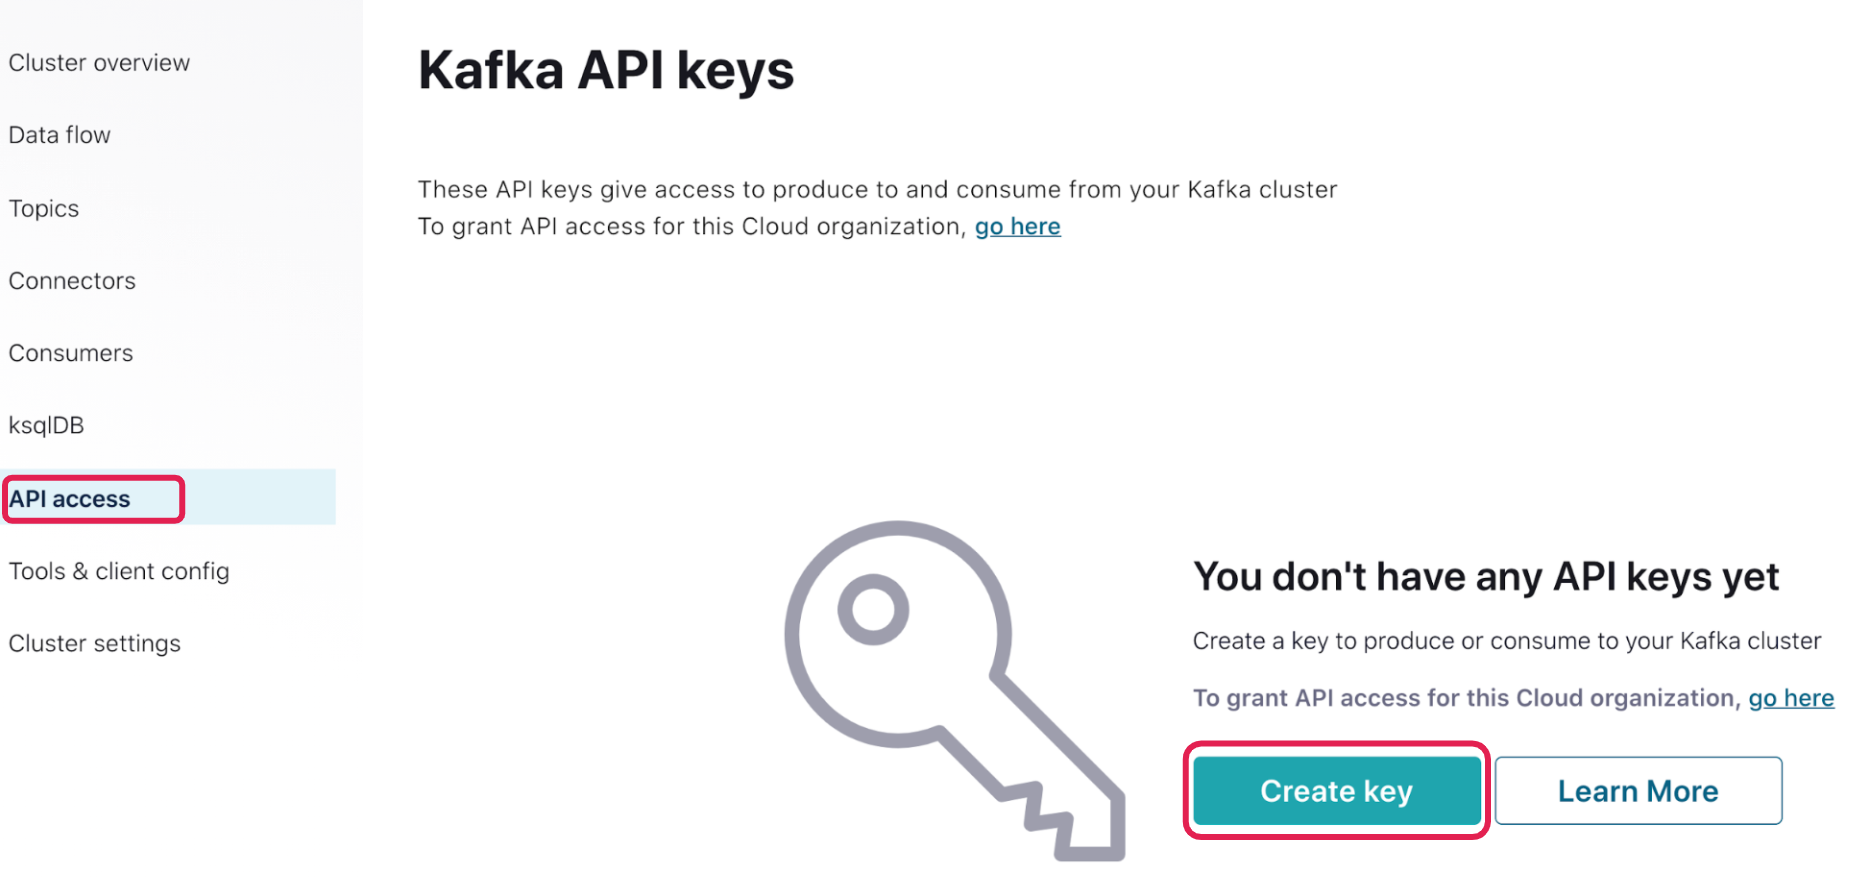 Kafka API keys | API access | Create key